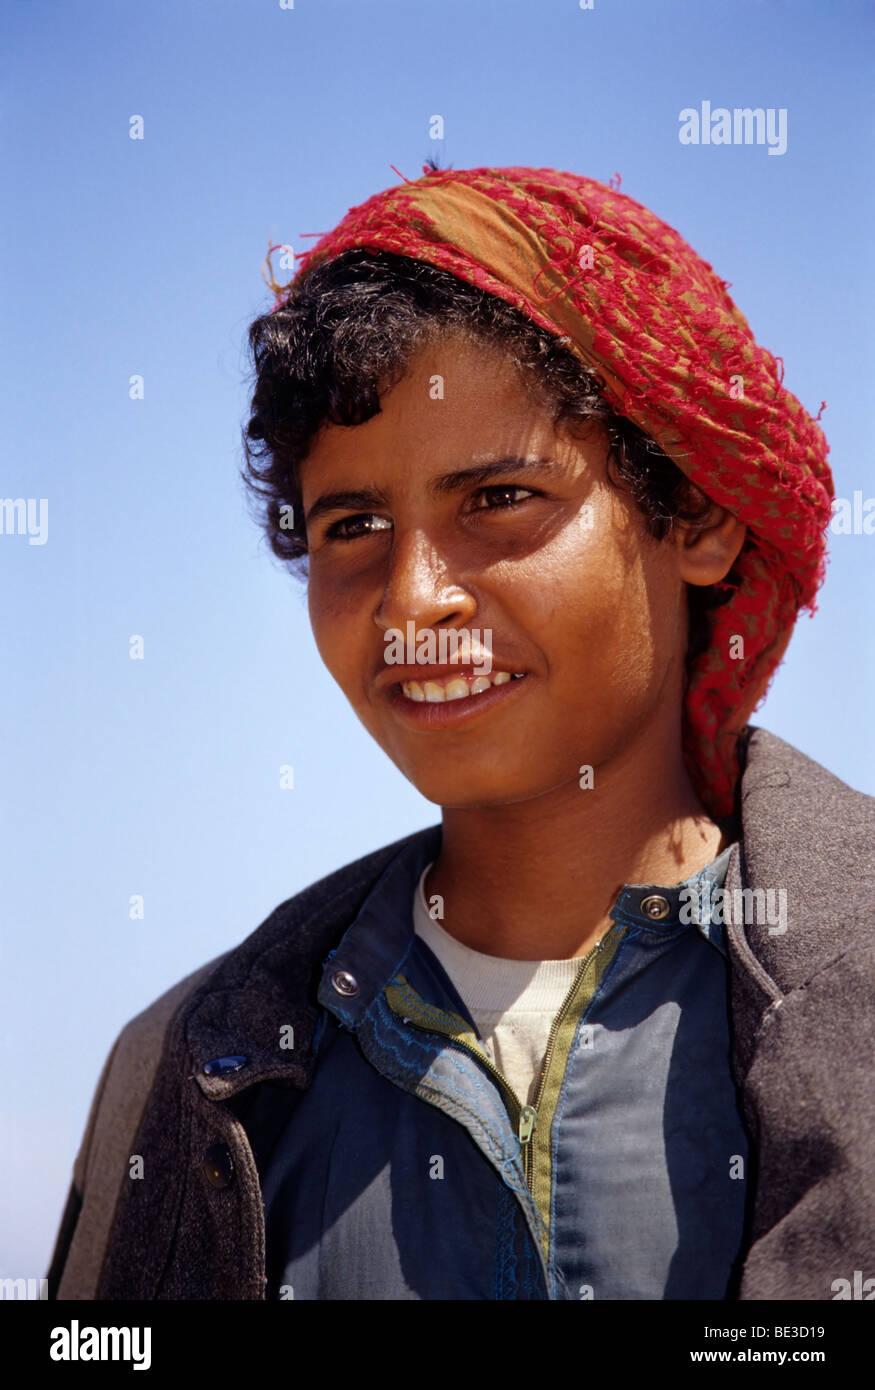 Camel shepherd, Egyptian in traditional dress, garment, portrait, Dschjellahba, Jelleba, clothes, Arabian, Egyptian, - Stock Image